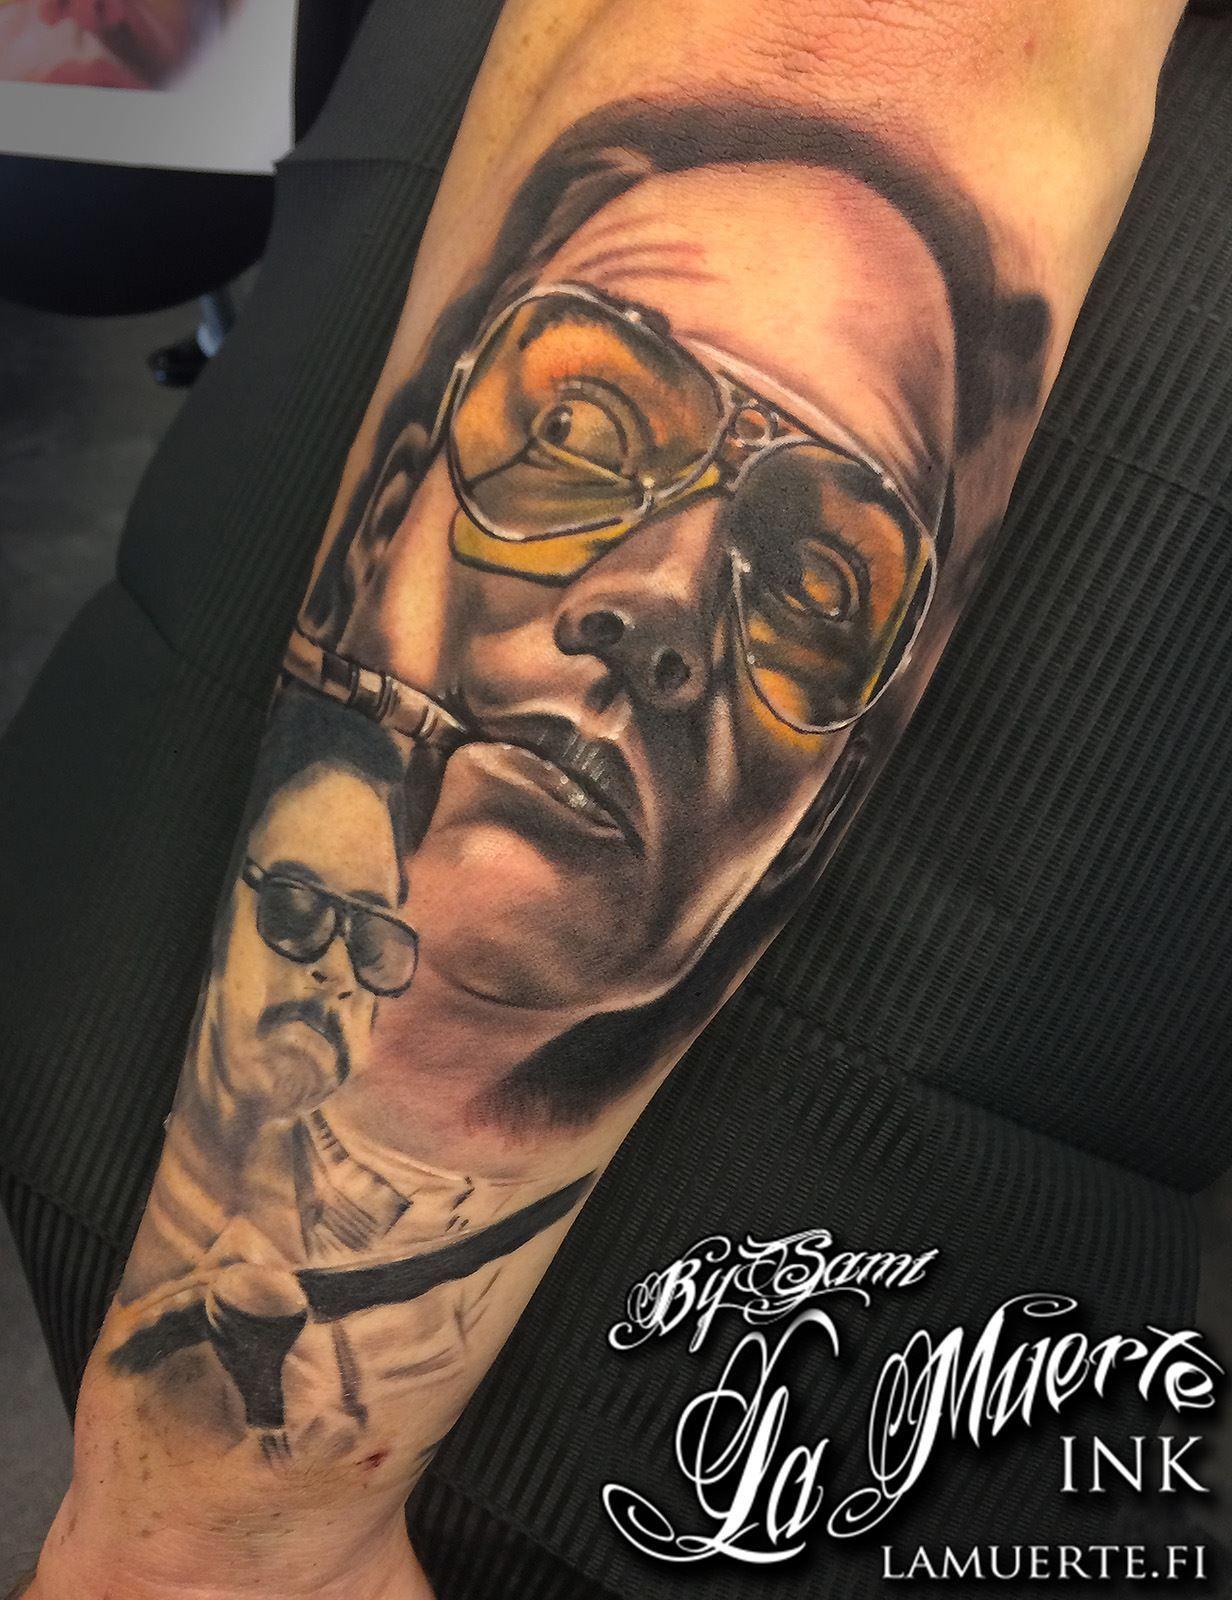 Fear and loathing in las vegas johnny depp tattoo by